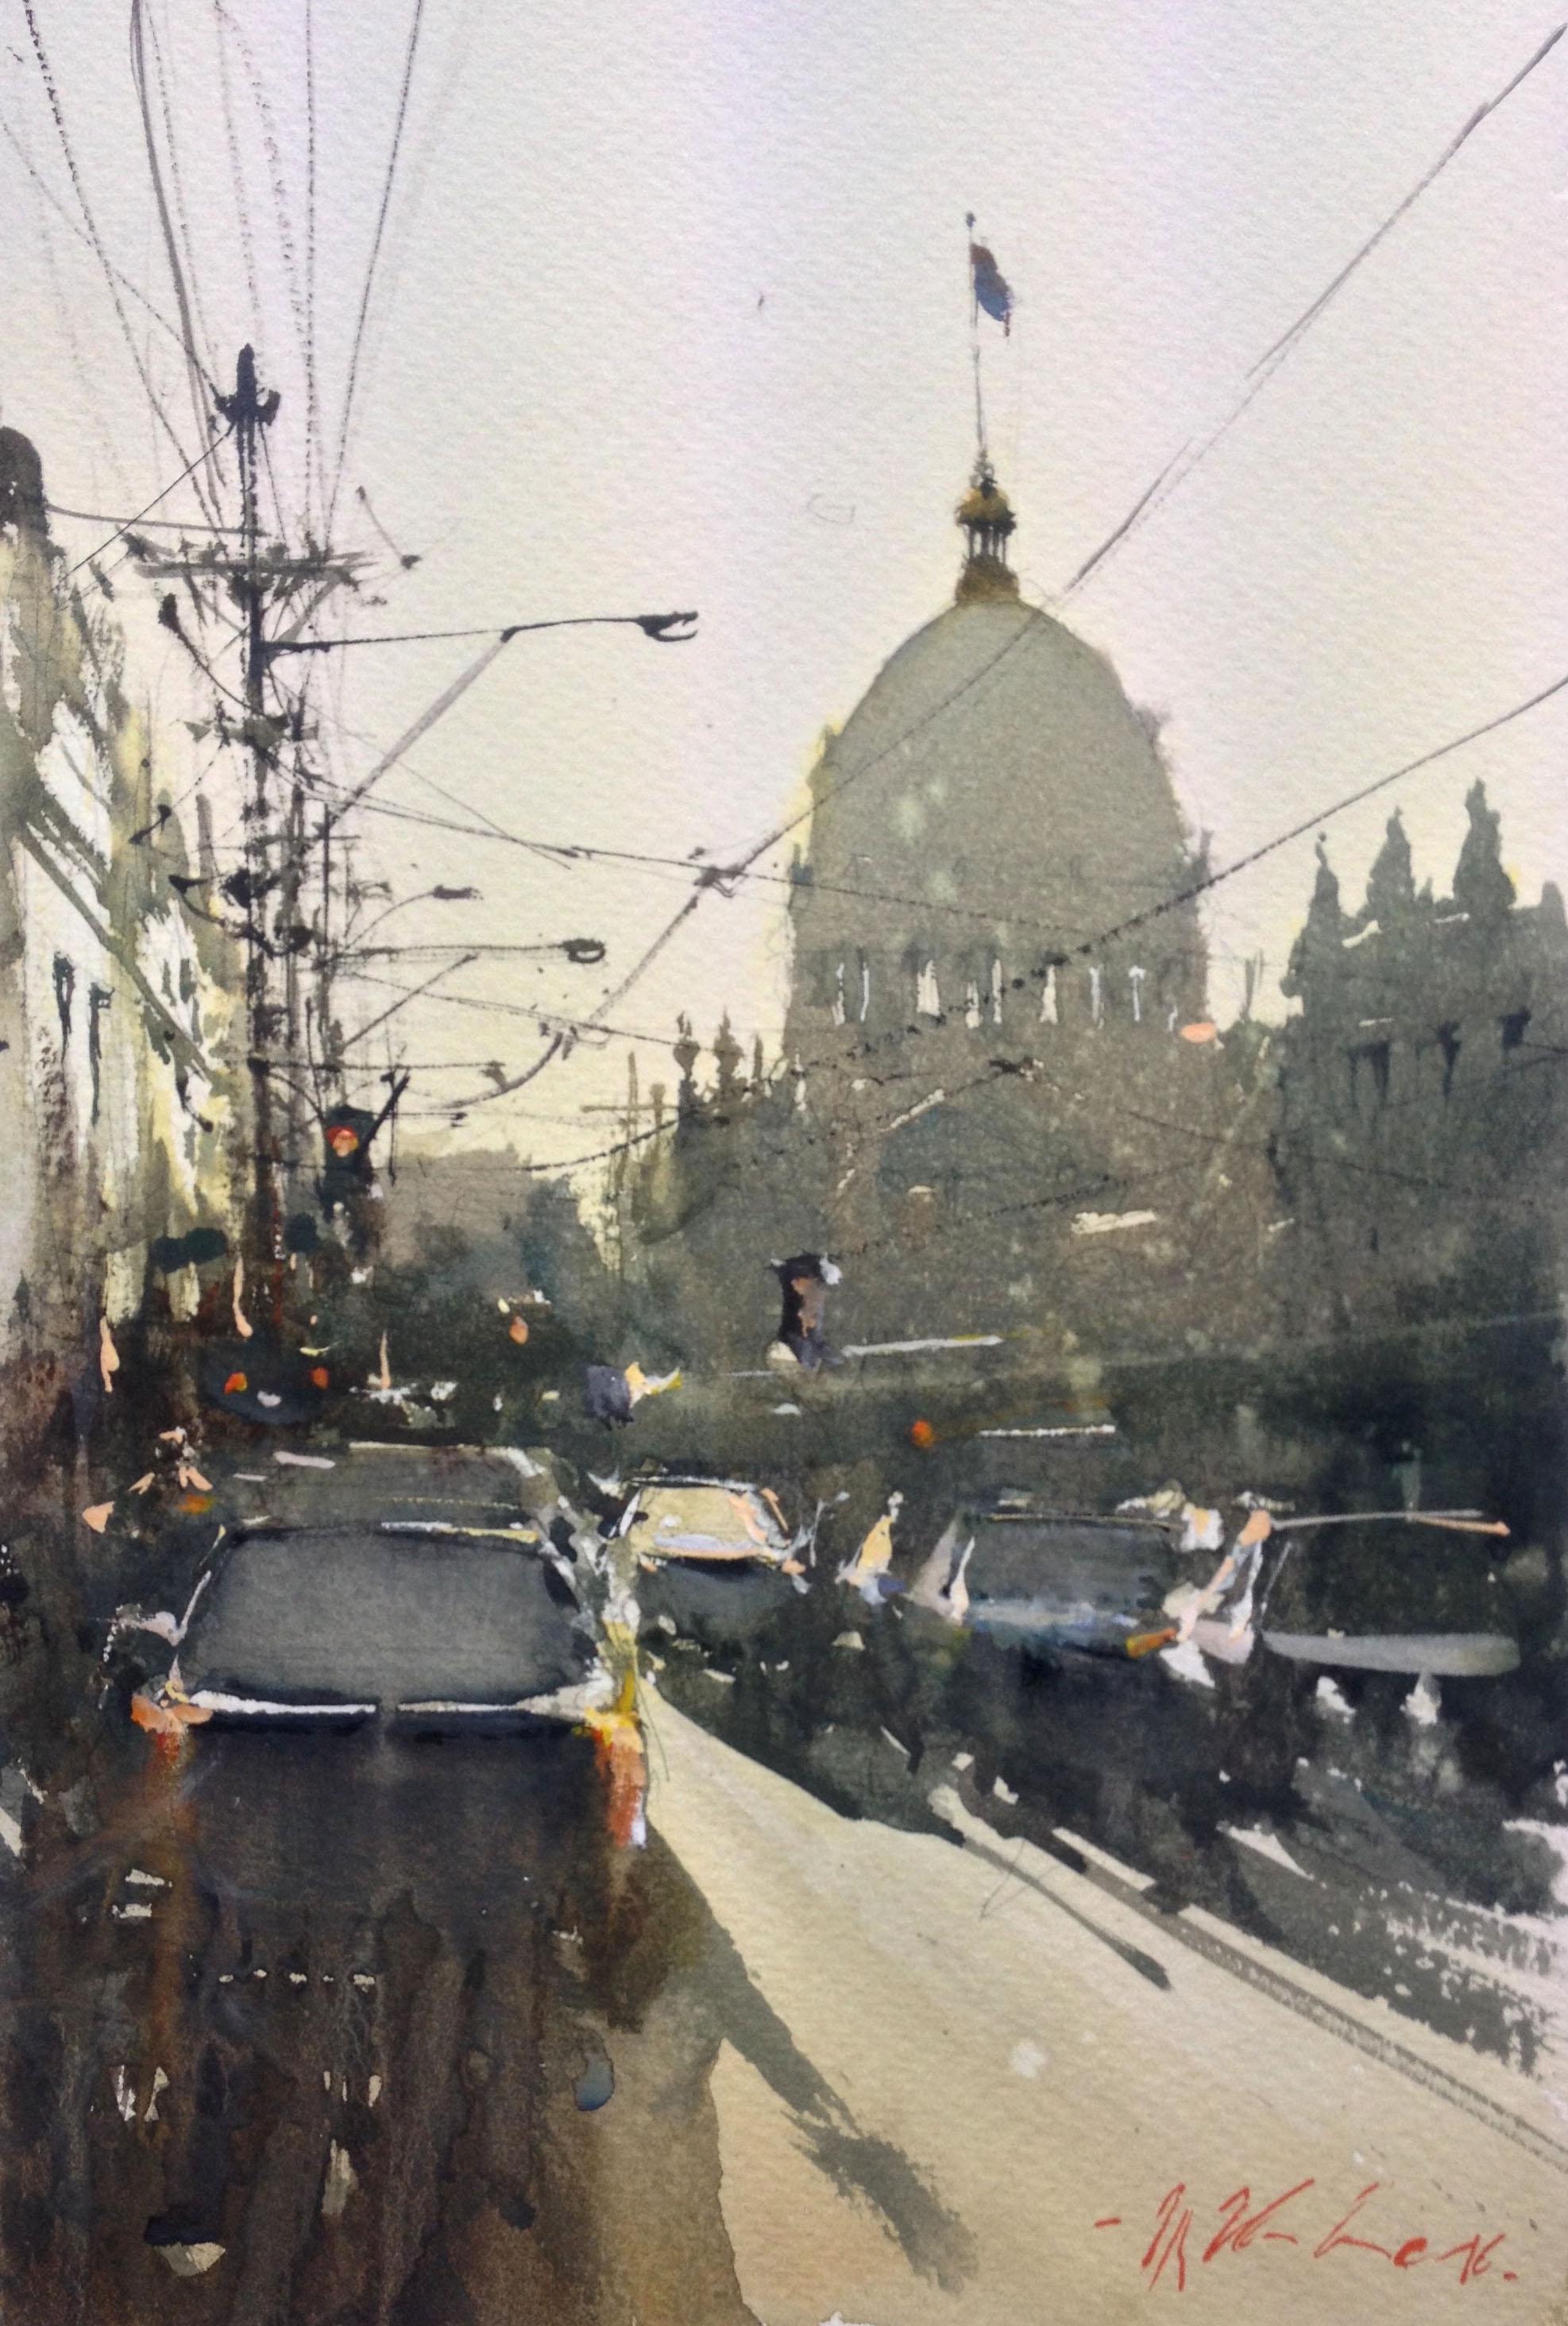 Joseph Zbukvic, Gertrude Street 1 Watercolour, framed, available